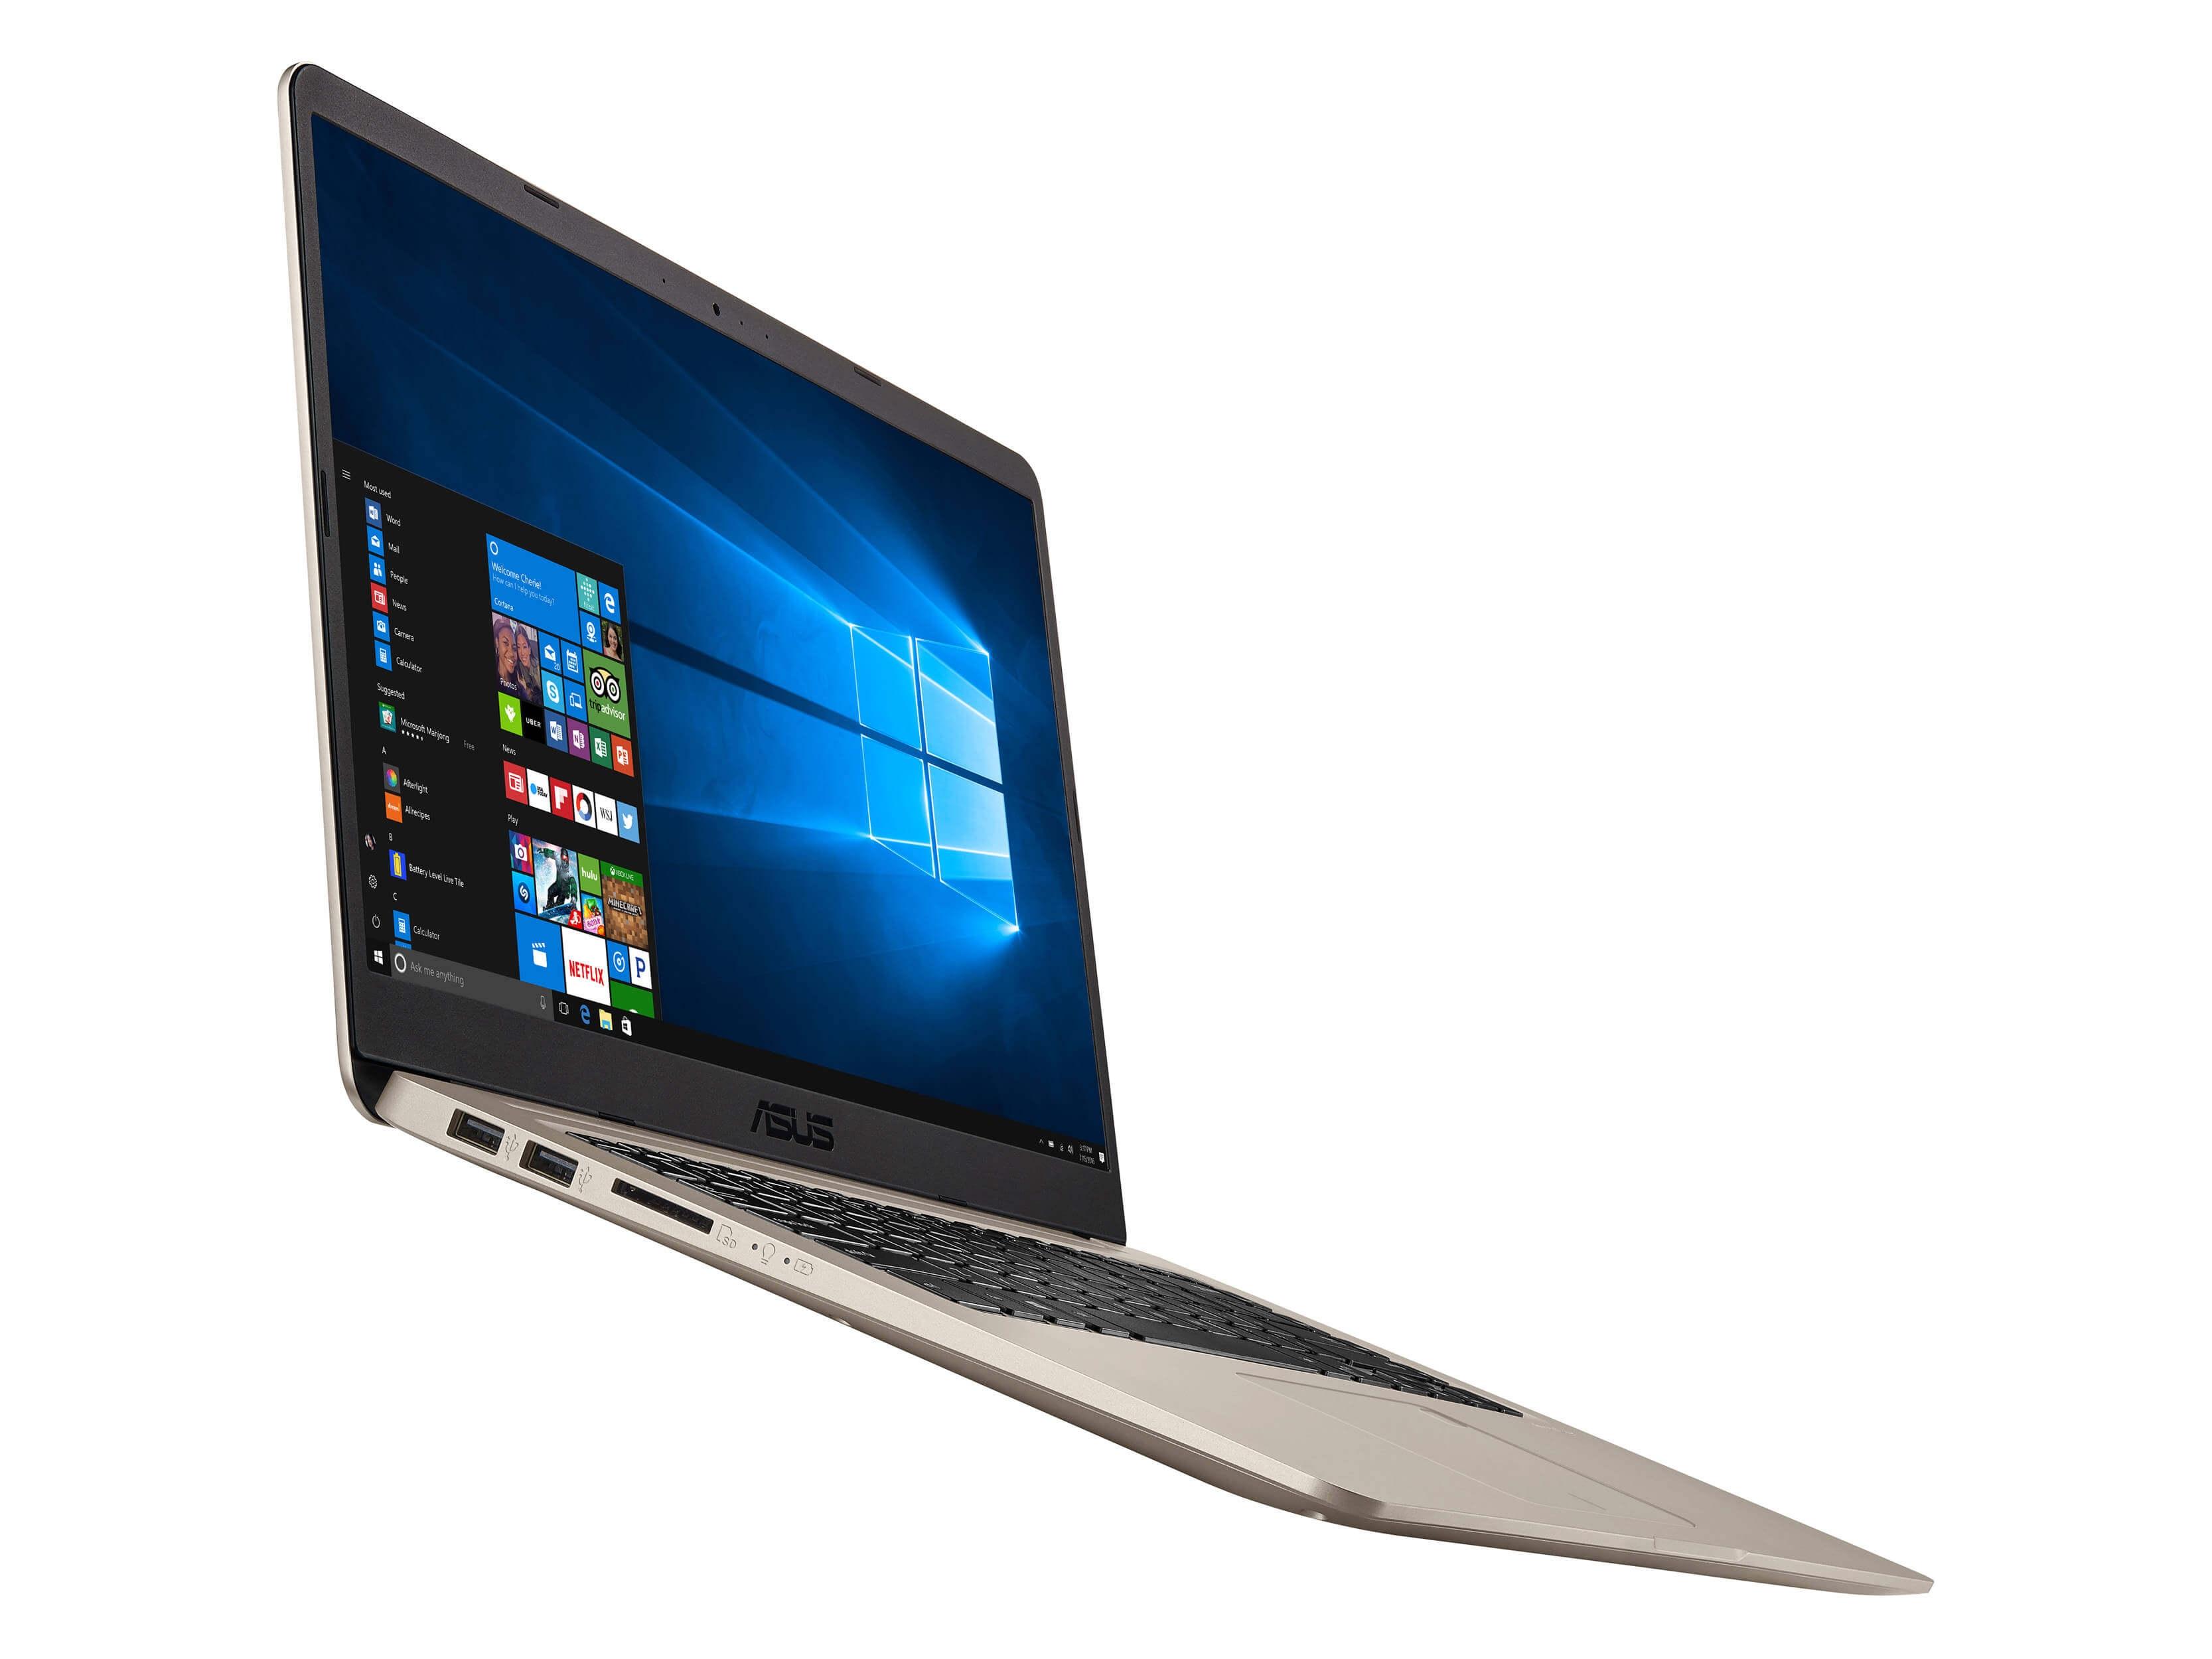 Asus Vivobook S15 S510uq I5 7200u 940mx Laptop Review Modem Bolt Lcd Slim Unlock All Gsm Reviews